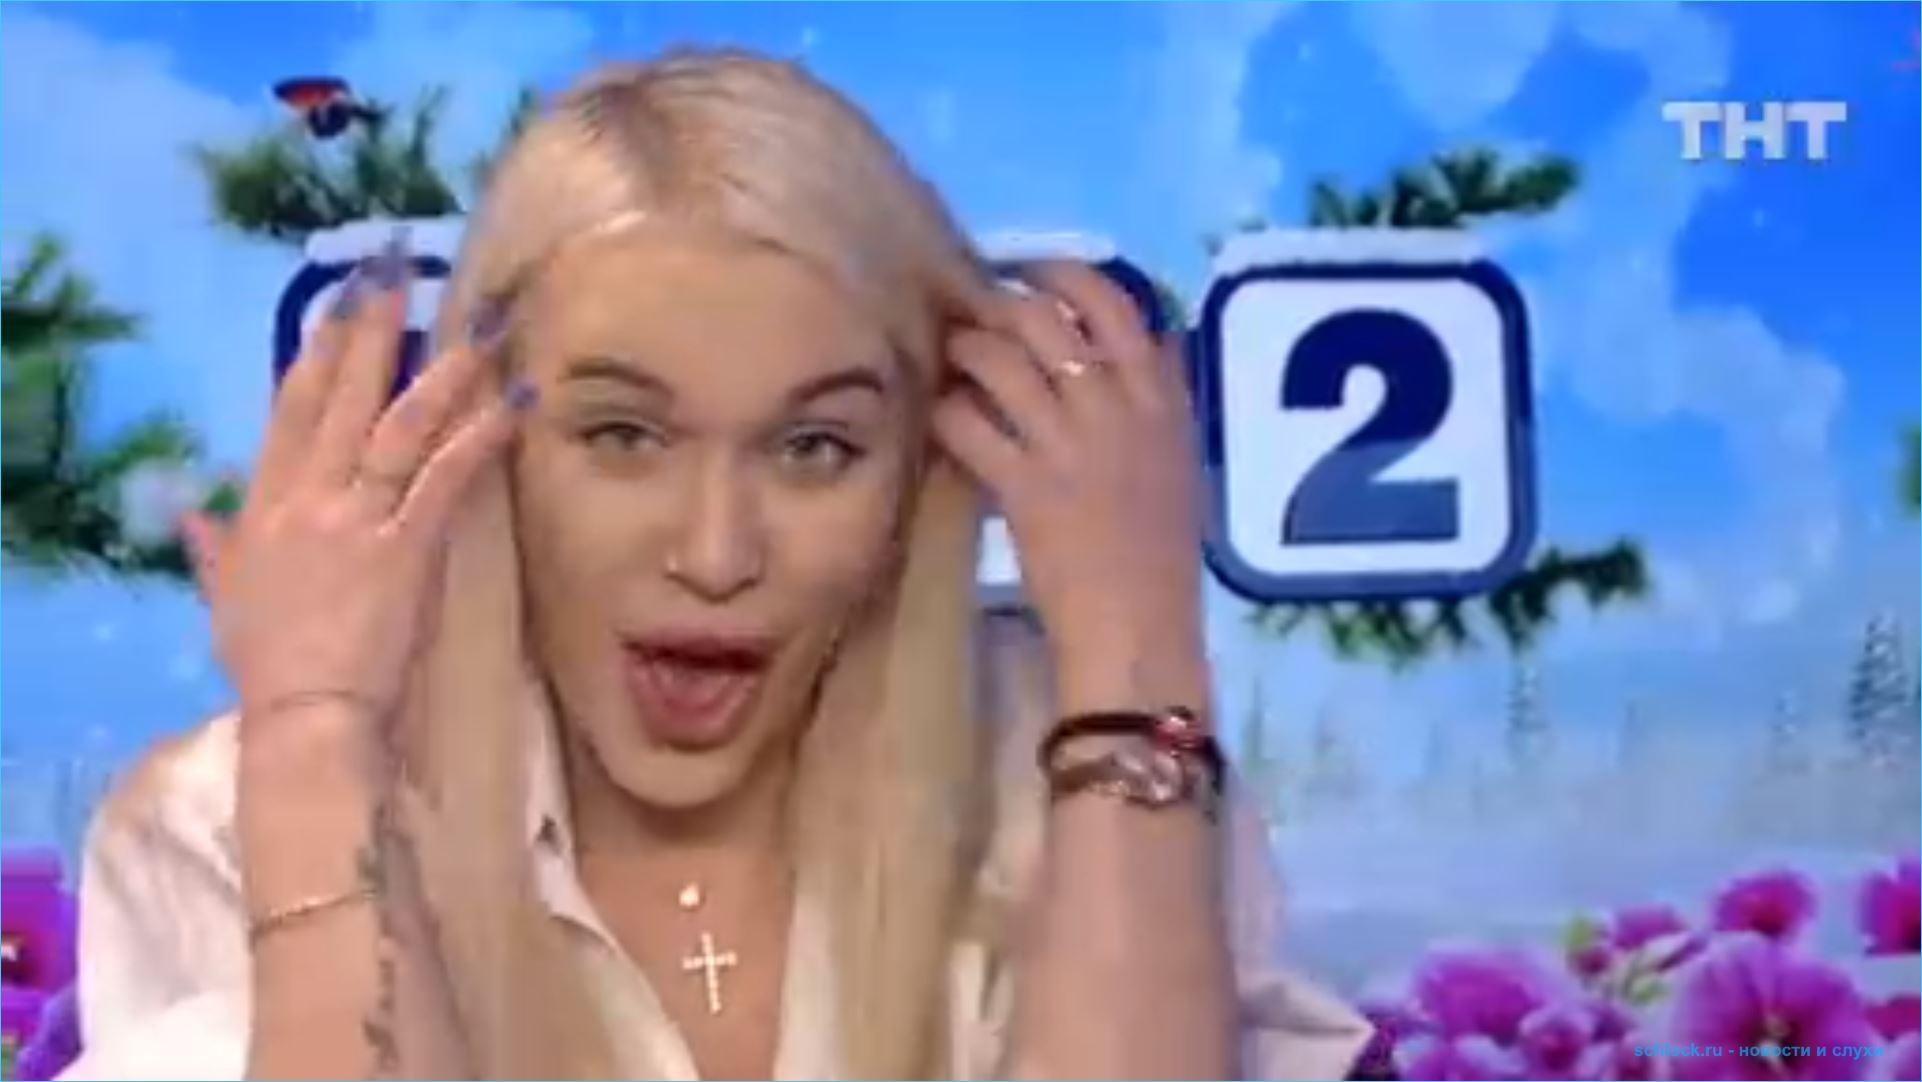 Яна Шевцова подает в суд на Валерию Фрост за клевету!